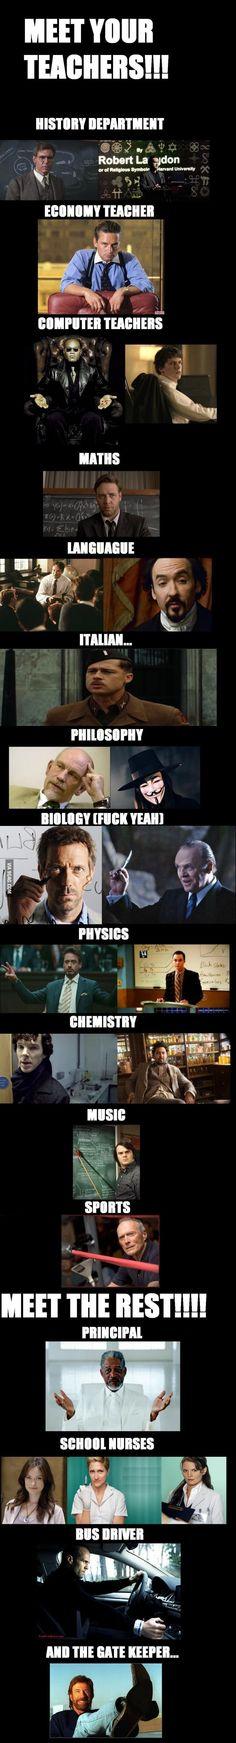 The Coolest Teachers On Earth